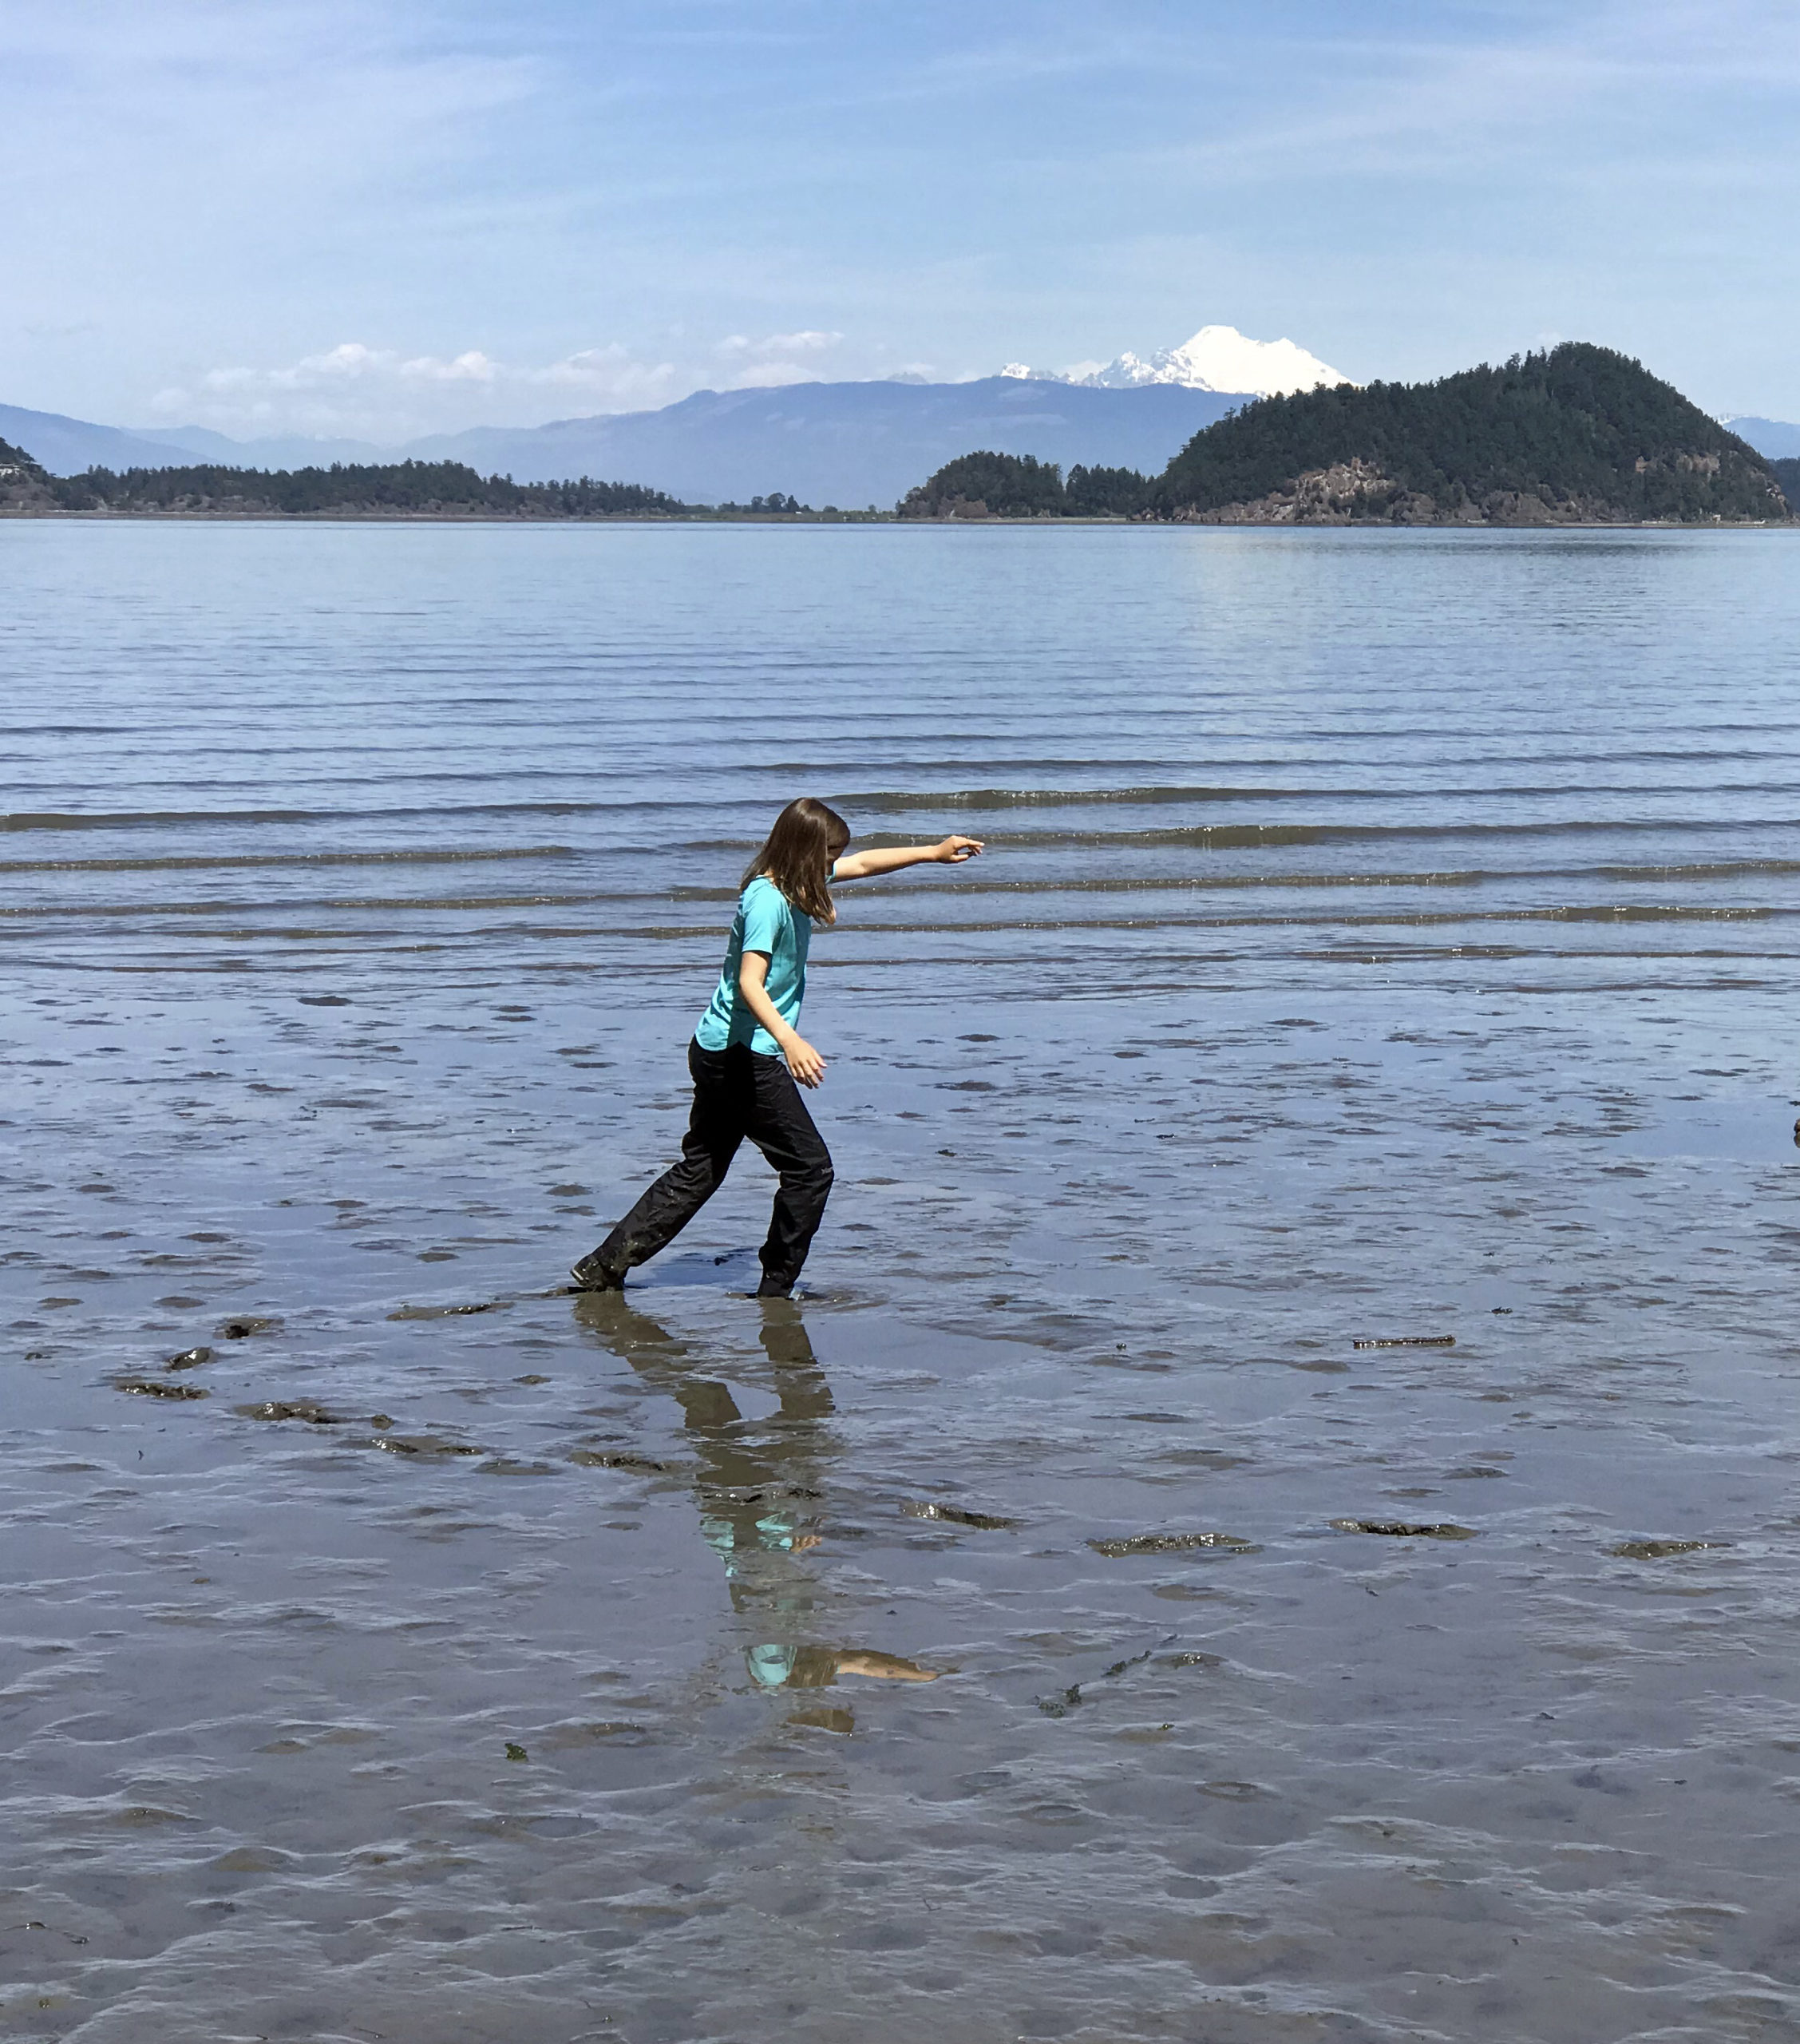 Enjoying the slimy mud tide flats at Dugualla State Park beach